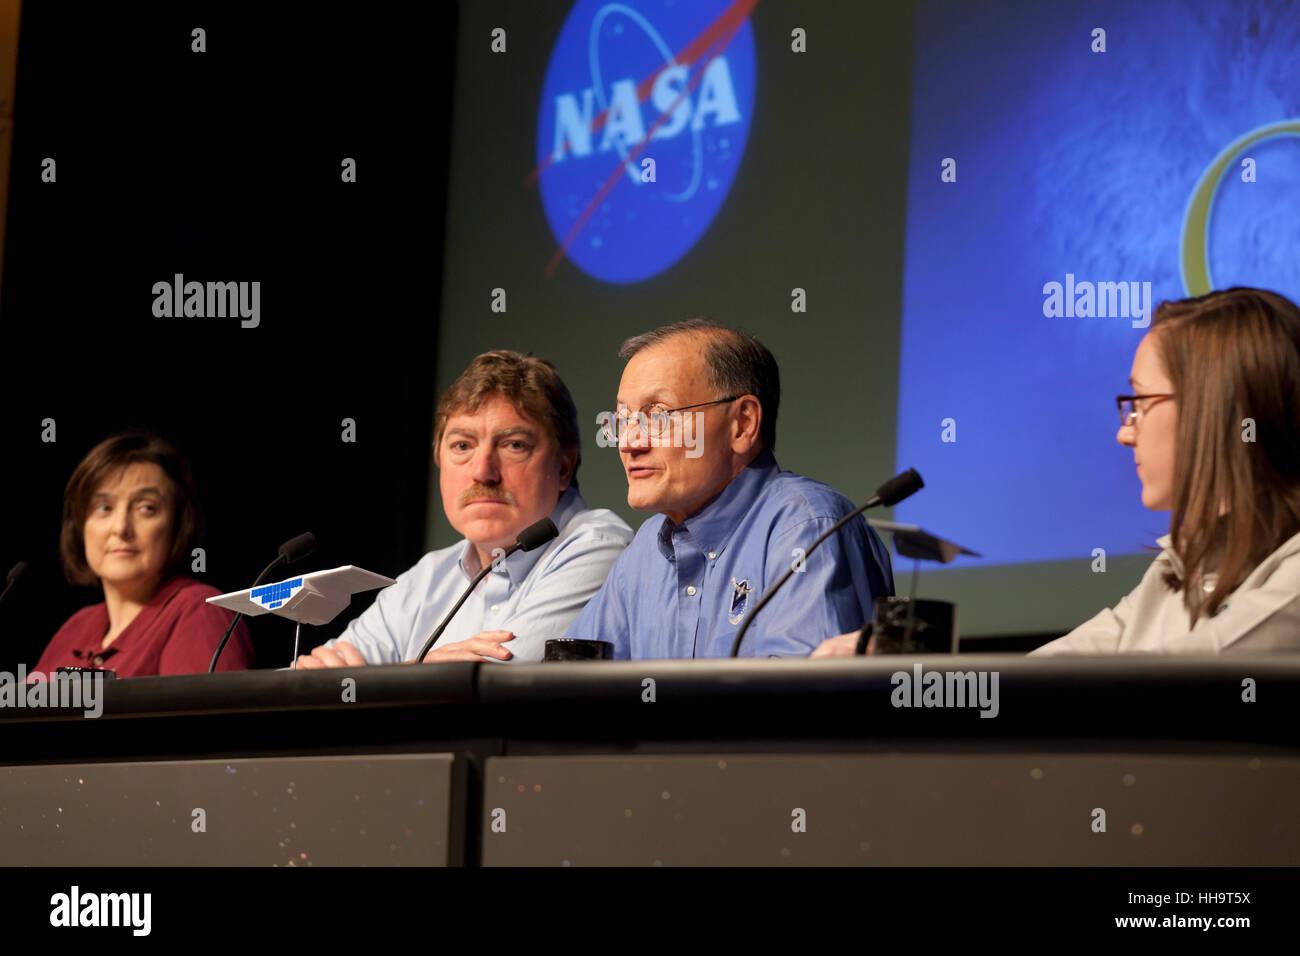 NASA earth scientists briefs the media on CYGNSS Hurricane Mission - Washington, DC USA - Stock Image